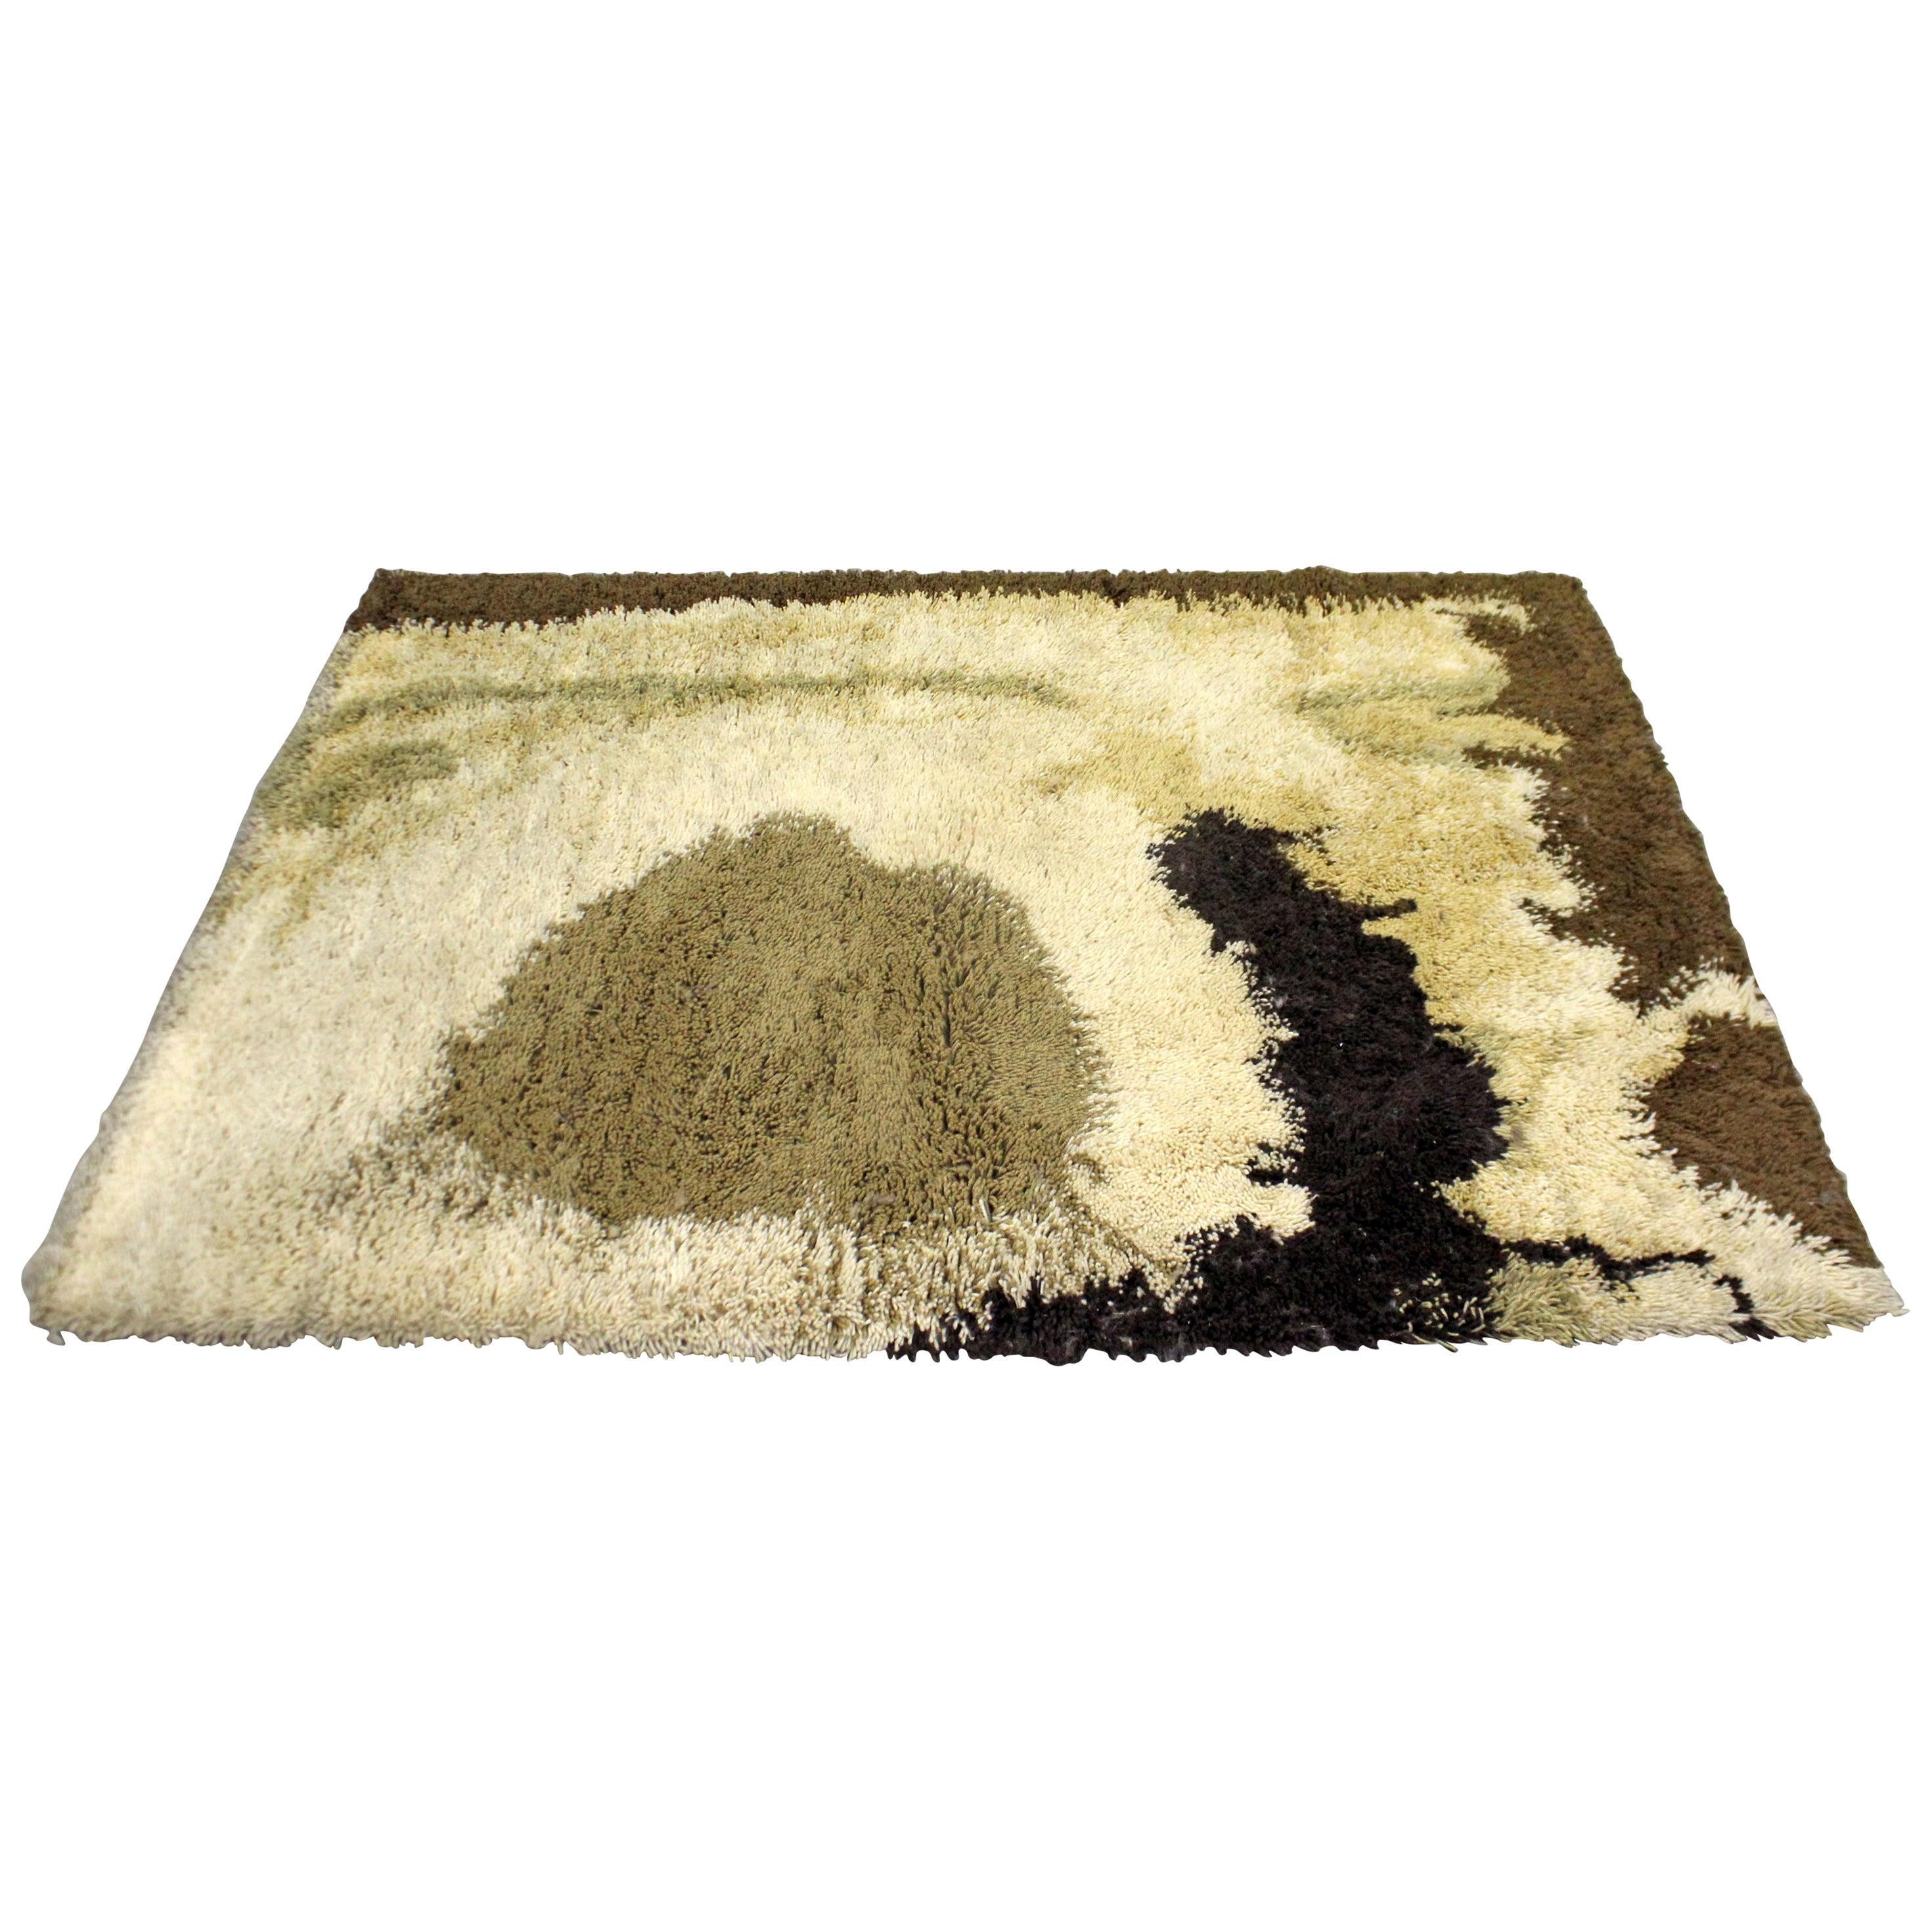 Midcentury Danish Modern Ege Rya Wool Shag Rug 'Sunrise Lo'